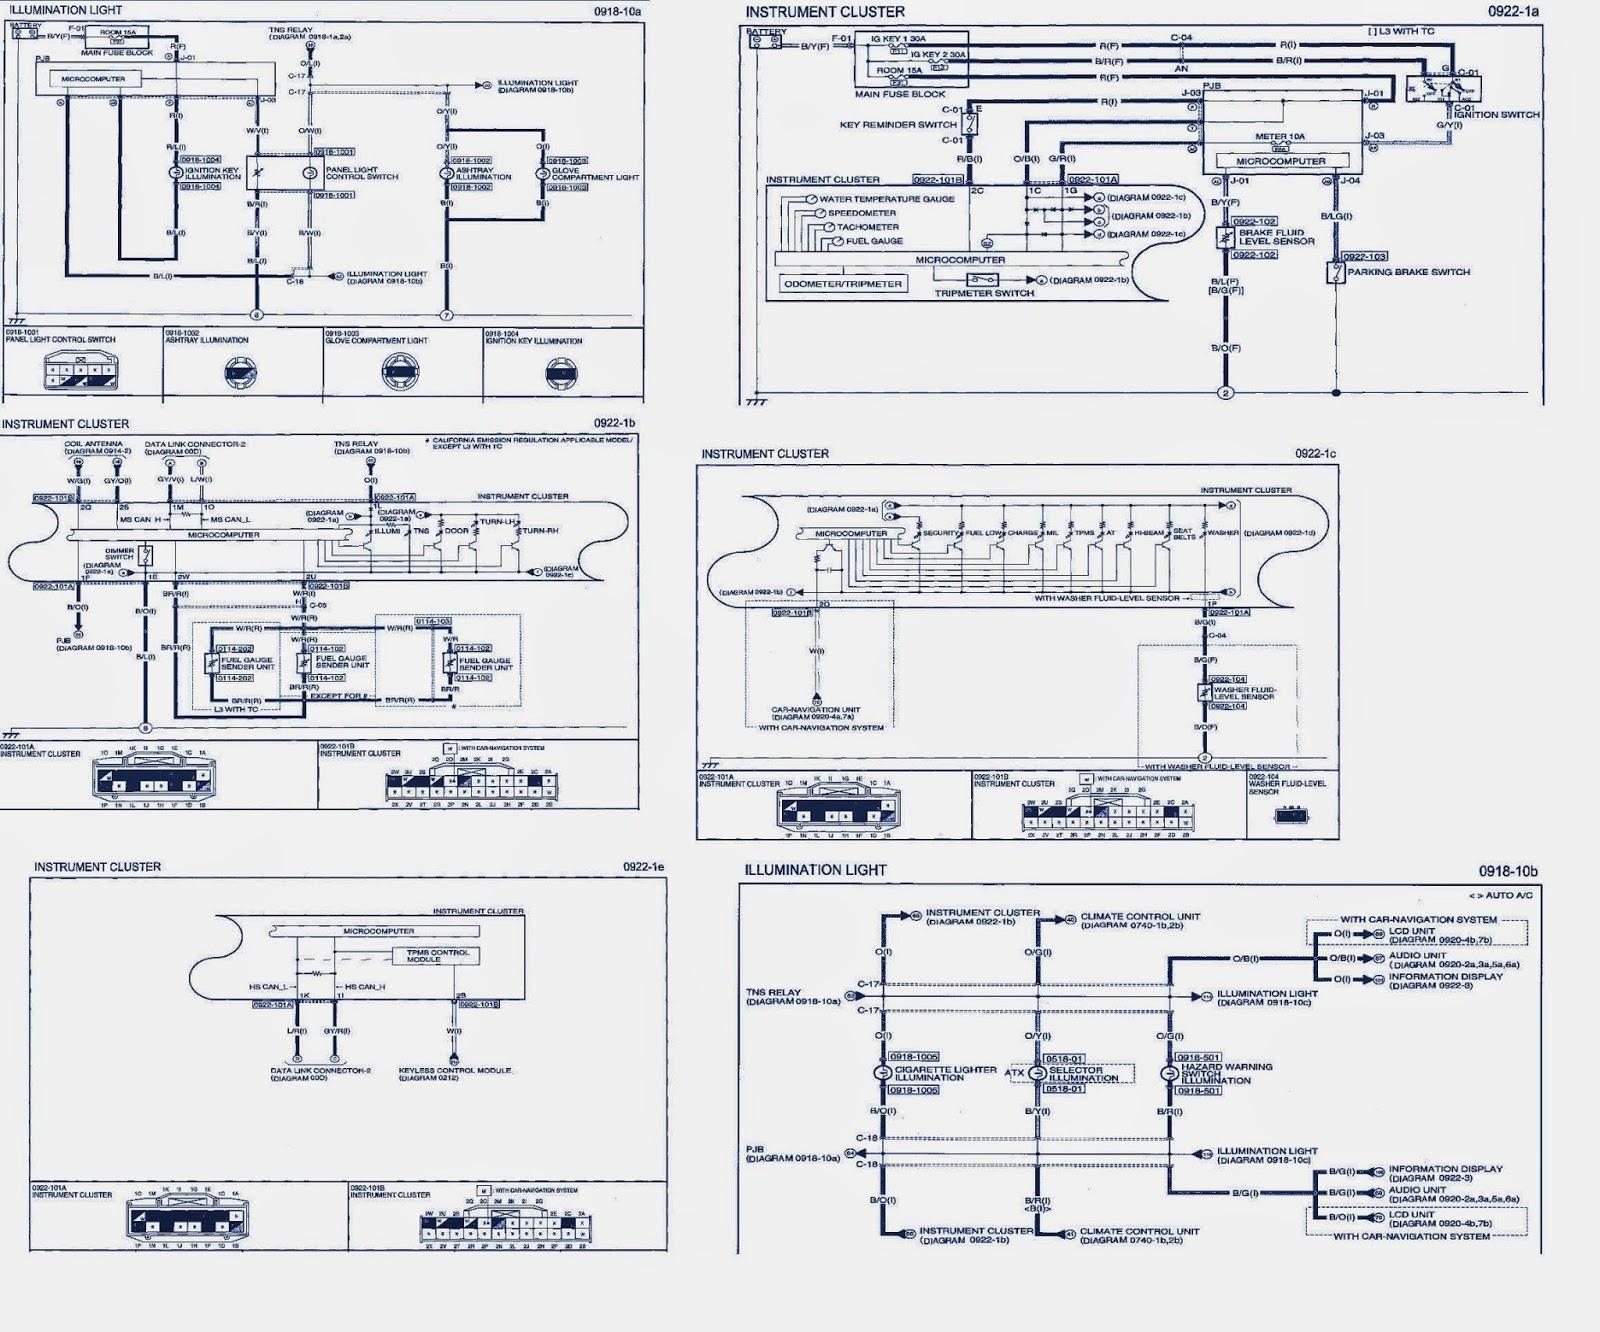 Comfortable mazda 3 wiring diagram contemporary electrical and mazda 3 cruise control wiring diagram cheapraybanclubmaster Gallery